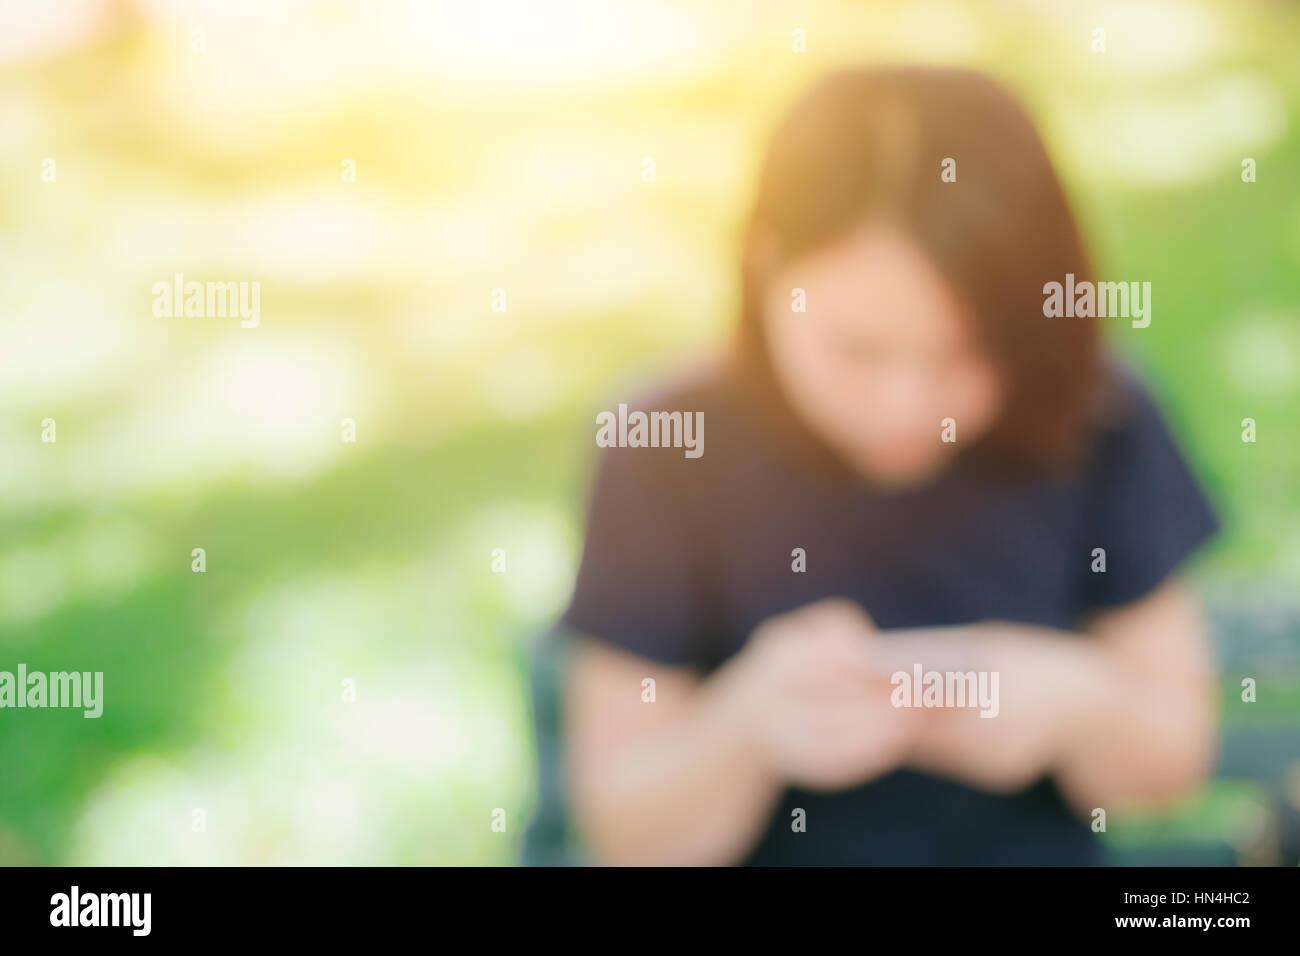 blur teen phone chat for background, Asian girl black short hair ...